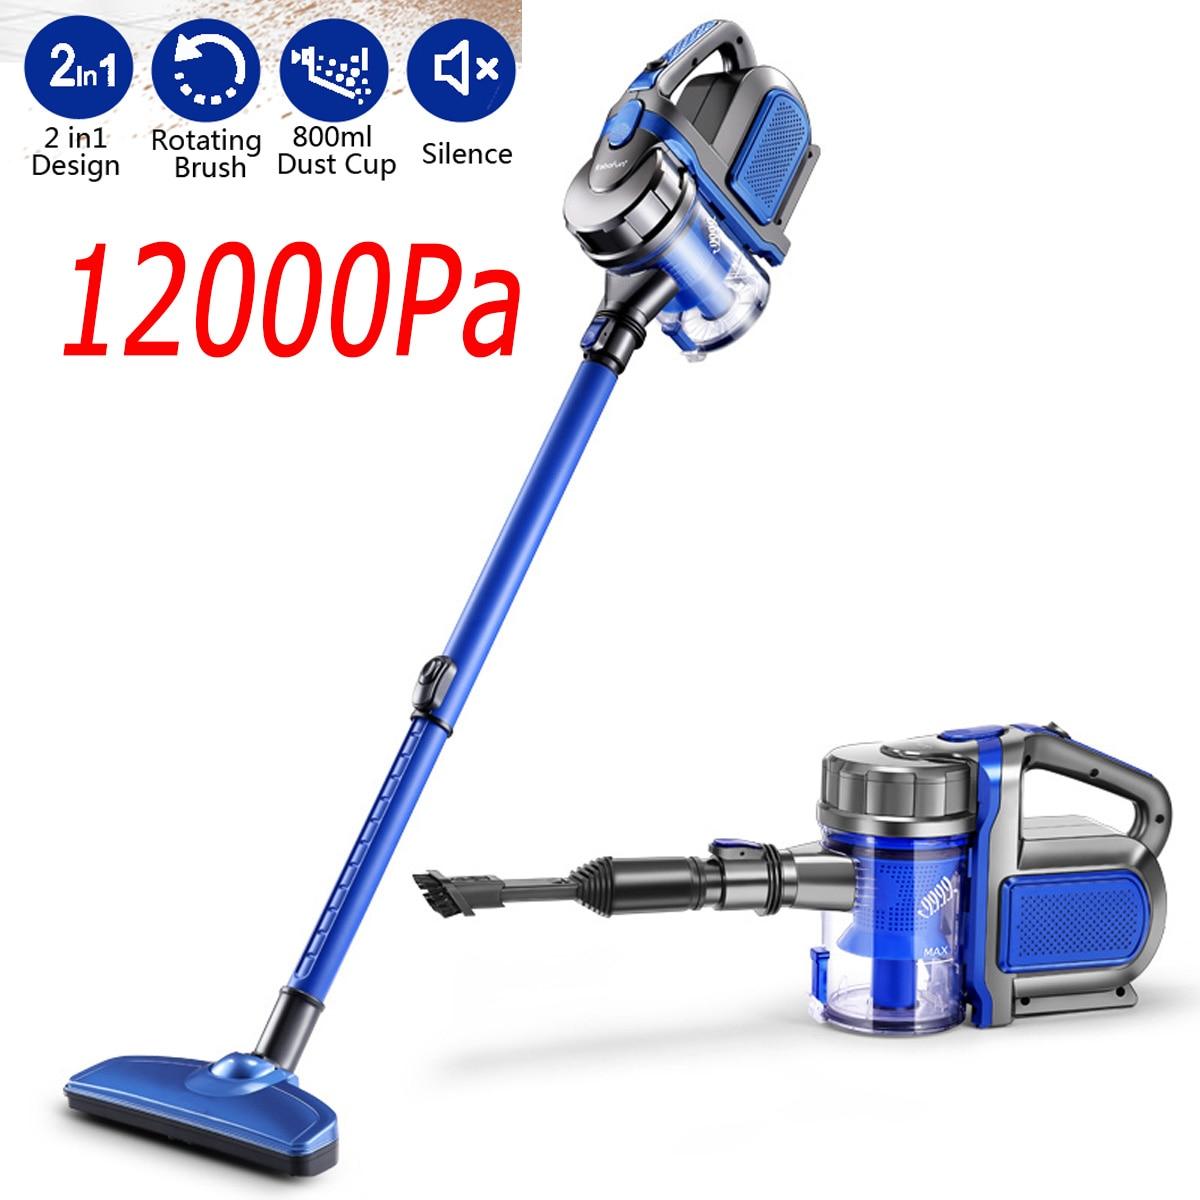 2 In 1 Handheld Cord Vacuum Cleaner Cyclone 12000Pa Strong Suction Dust Collector Handheld Vacuum Cleaner